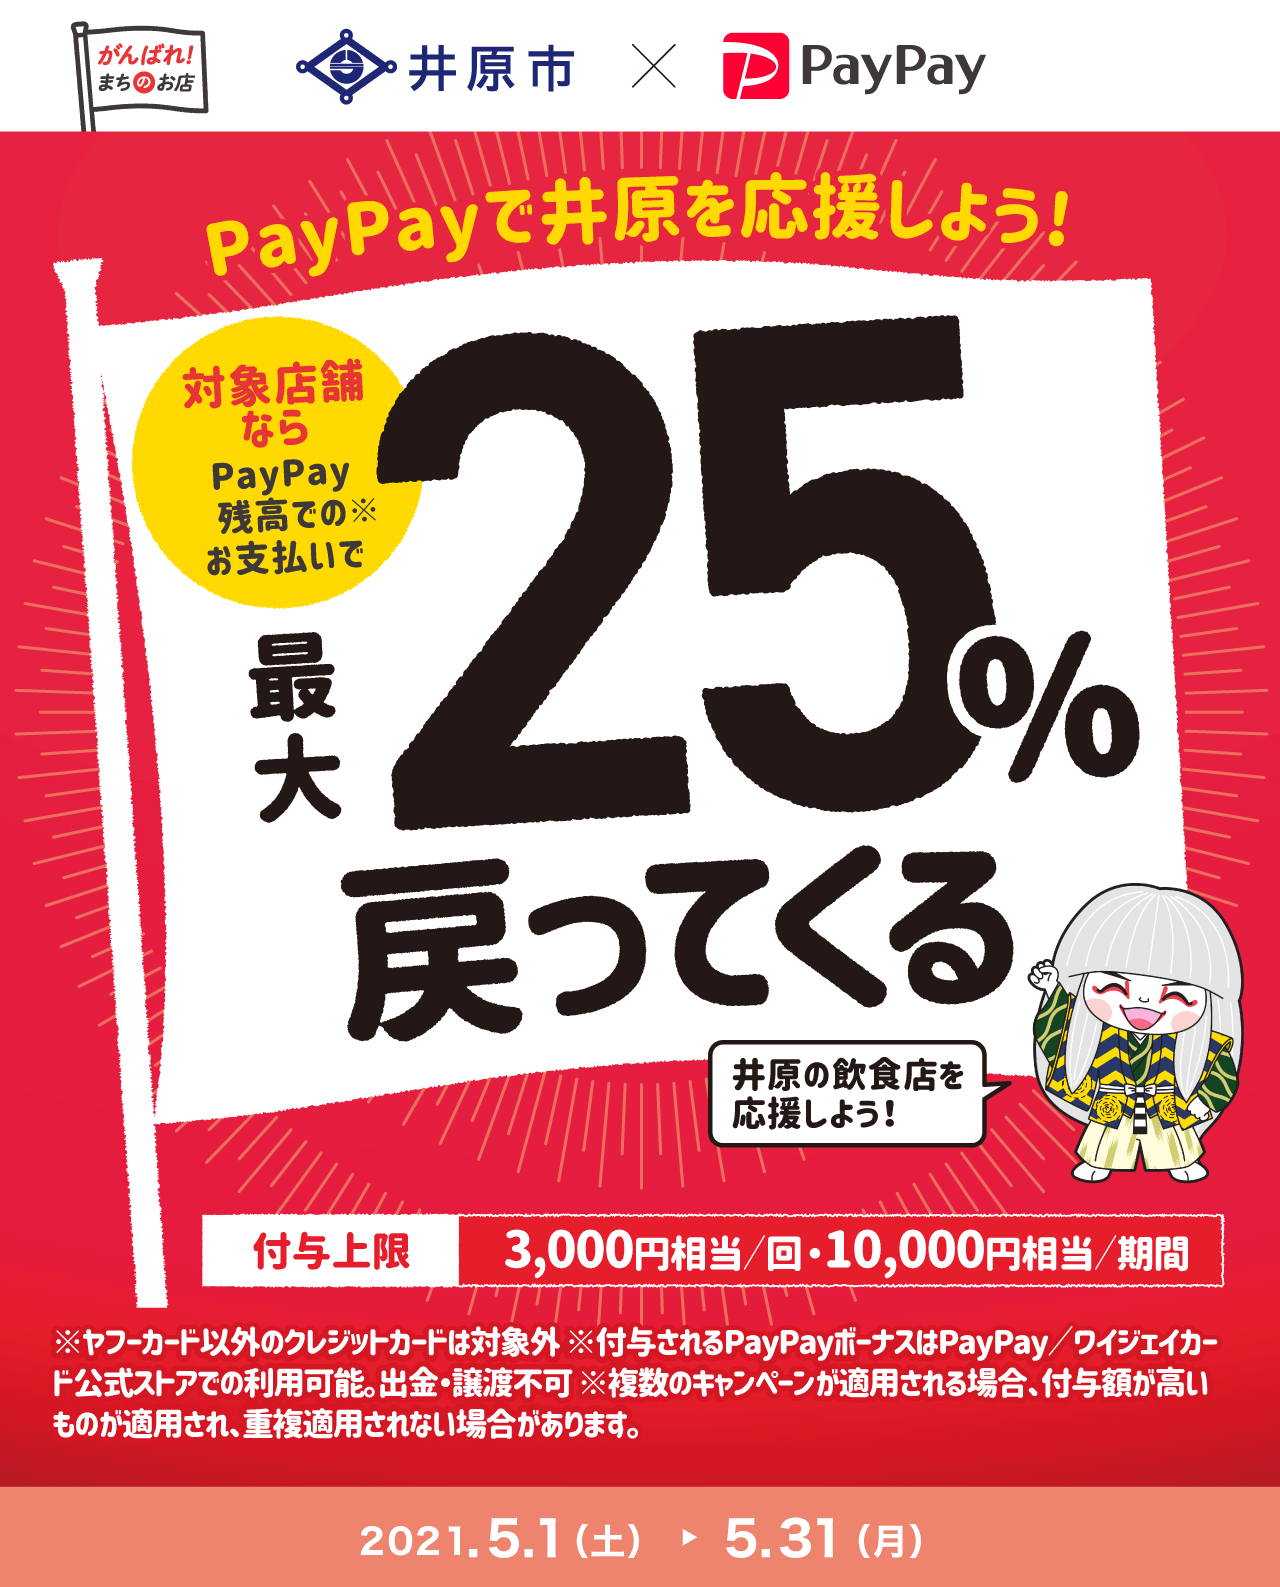 PayPayで井原を応援しよう!対象店舗なら最大25%戻ってくる